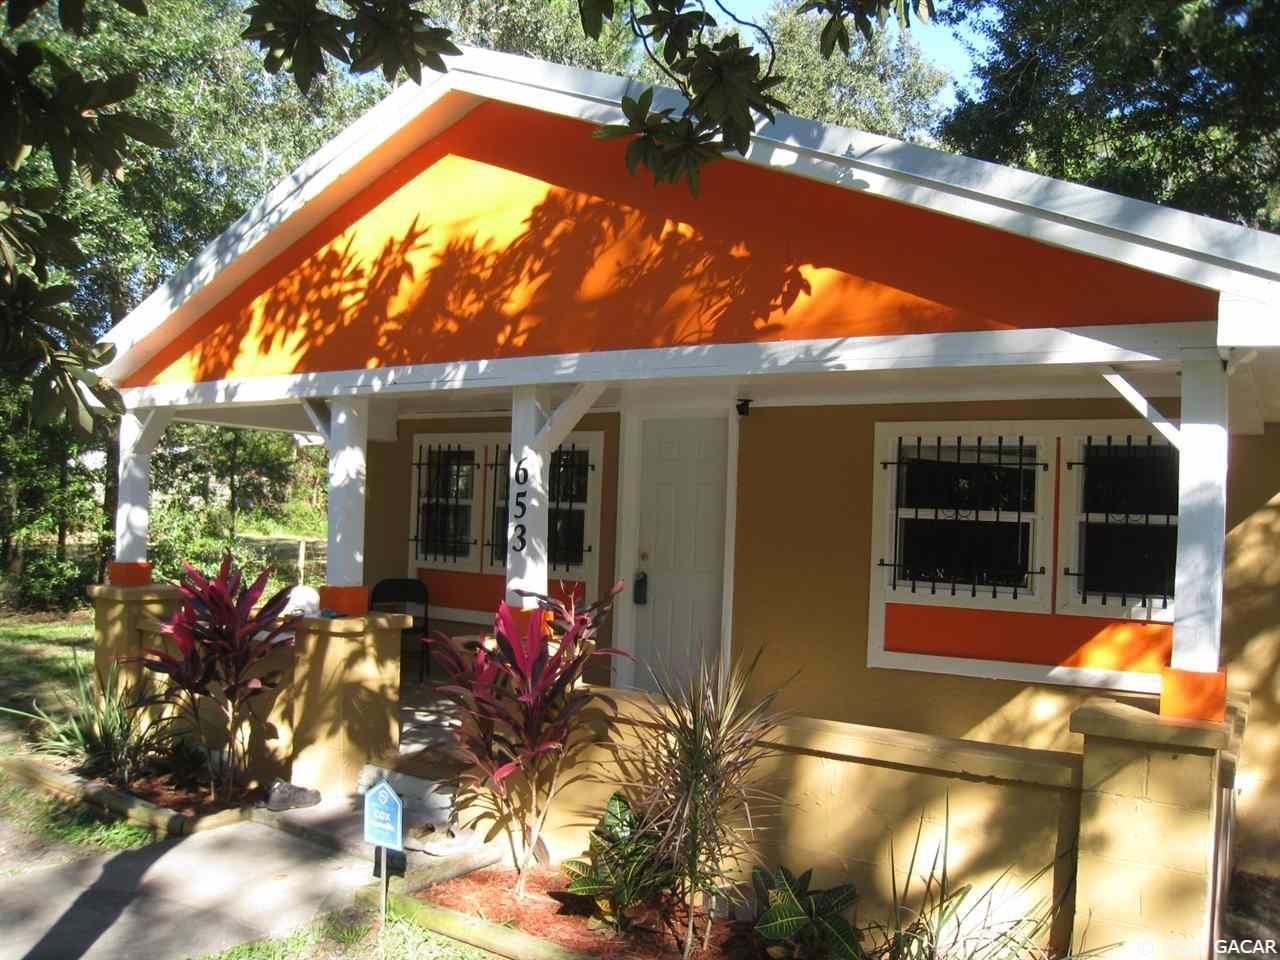 653 NE 16th Terrace, Gainesville, FL 62641 - #: 439212